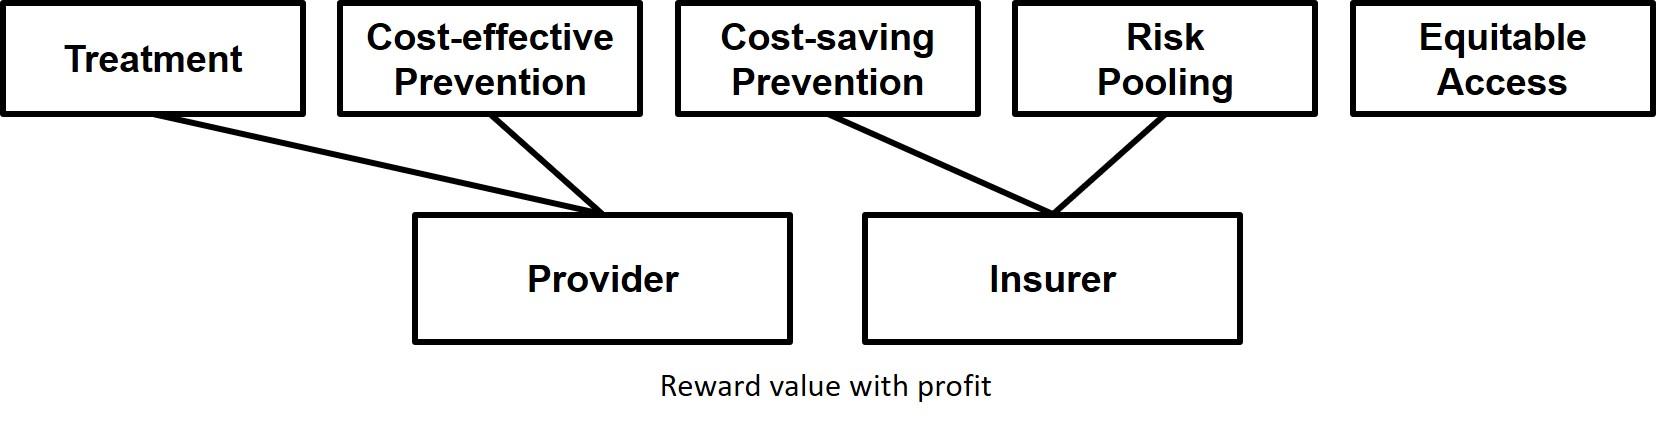 valuewithprofit